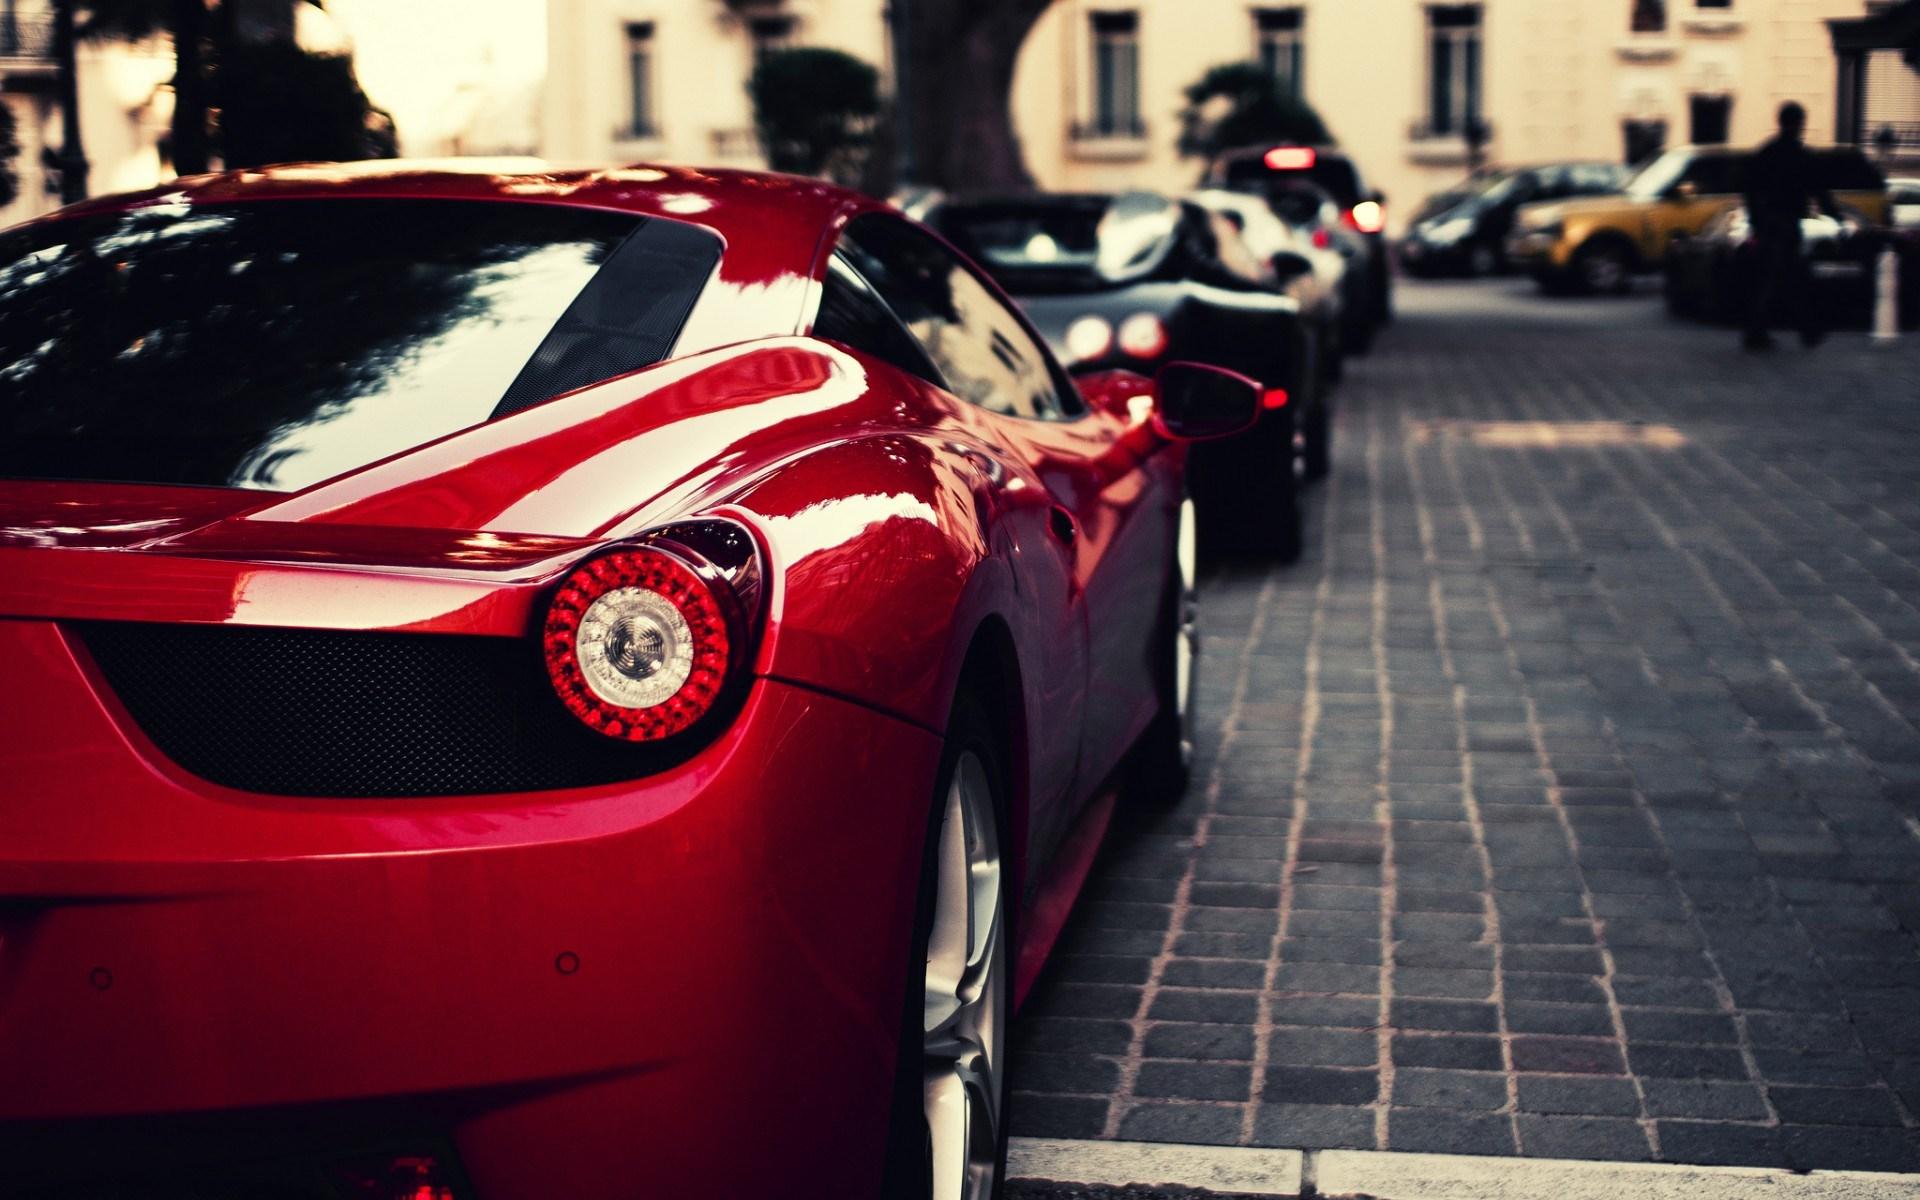 Ferrari 458 Italia Bugatti Veyron City Cars